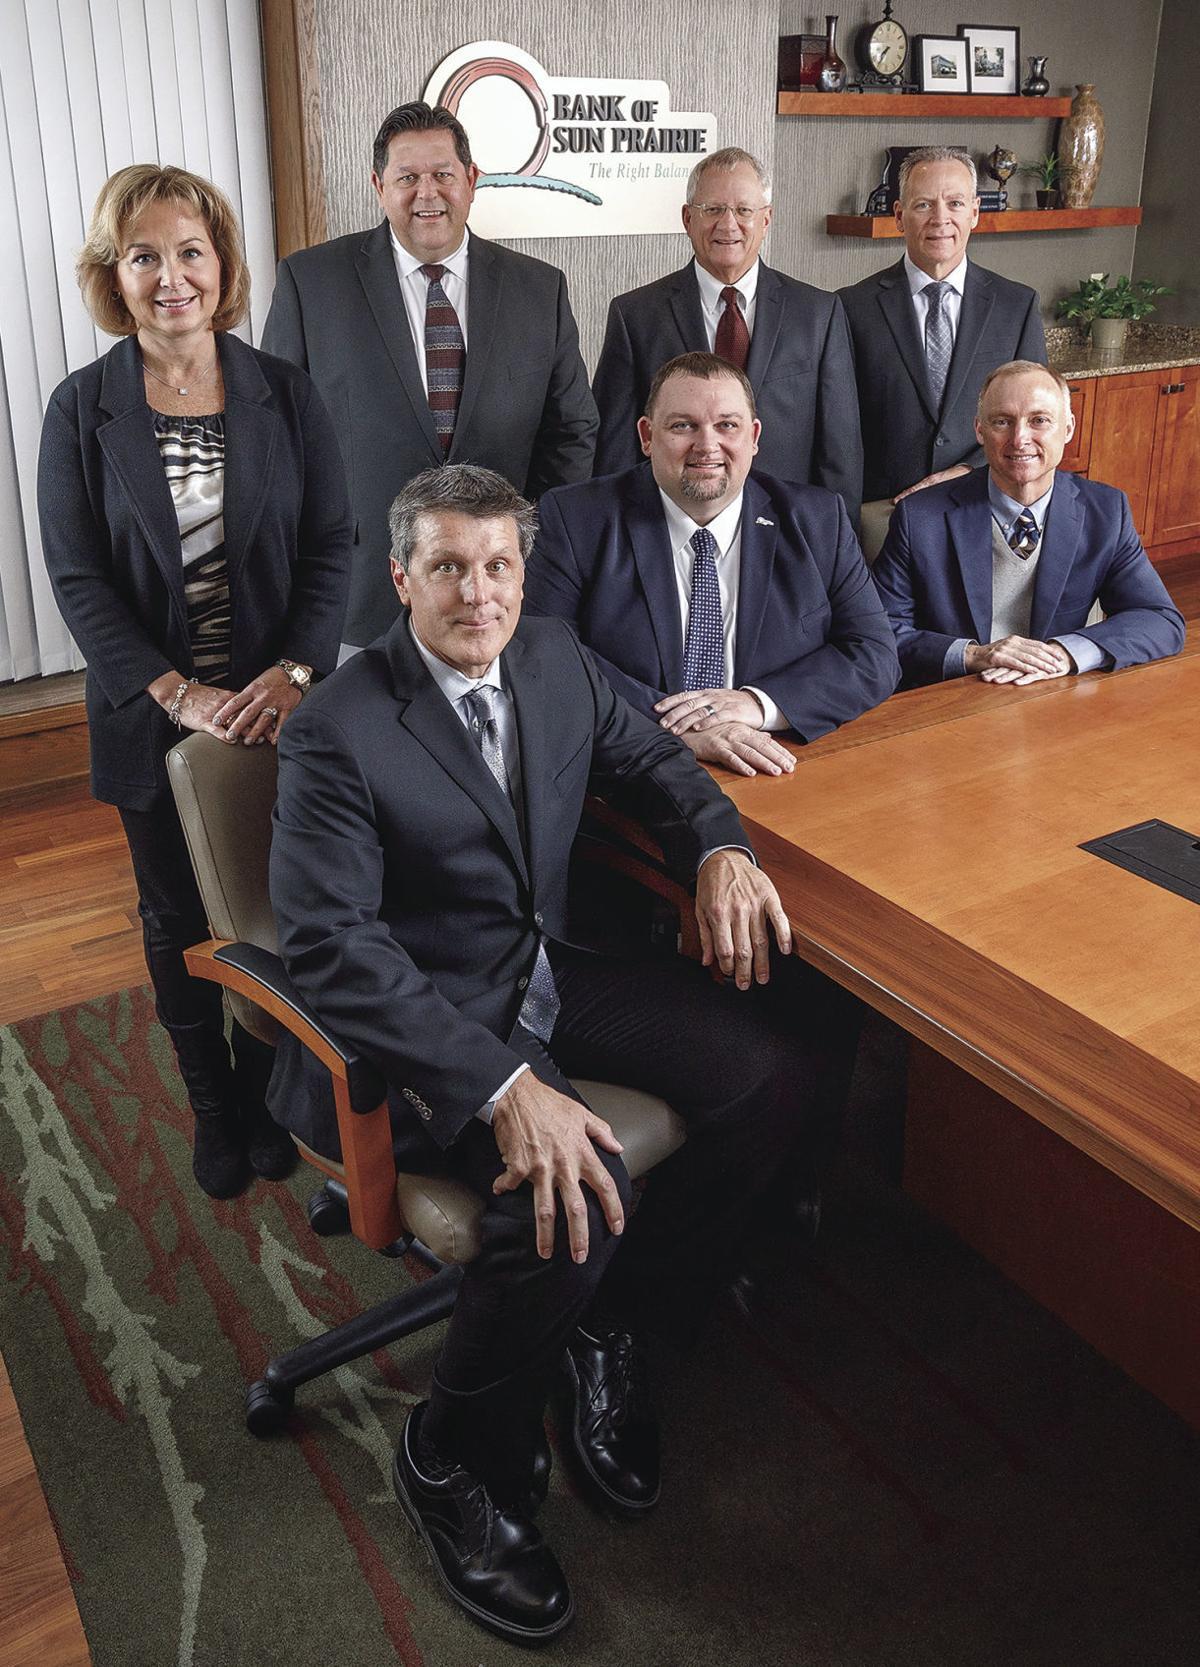 Augie List Jr. joins bank board